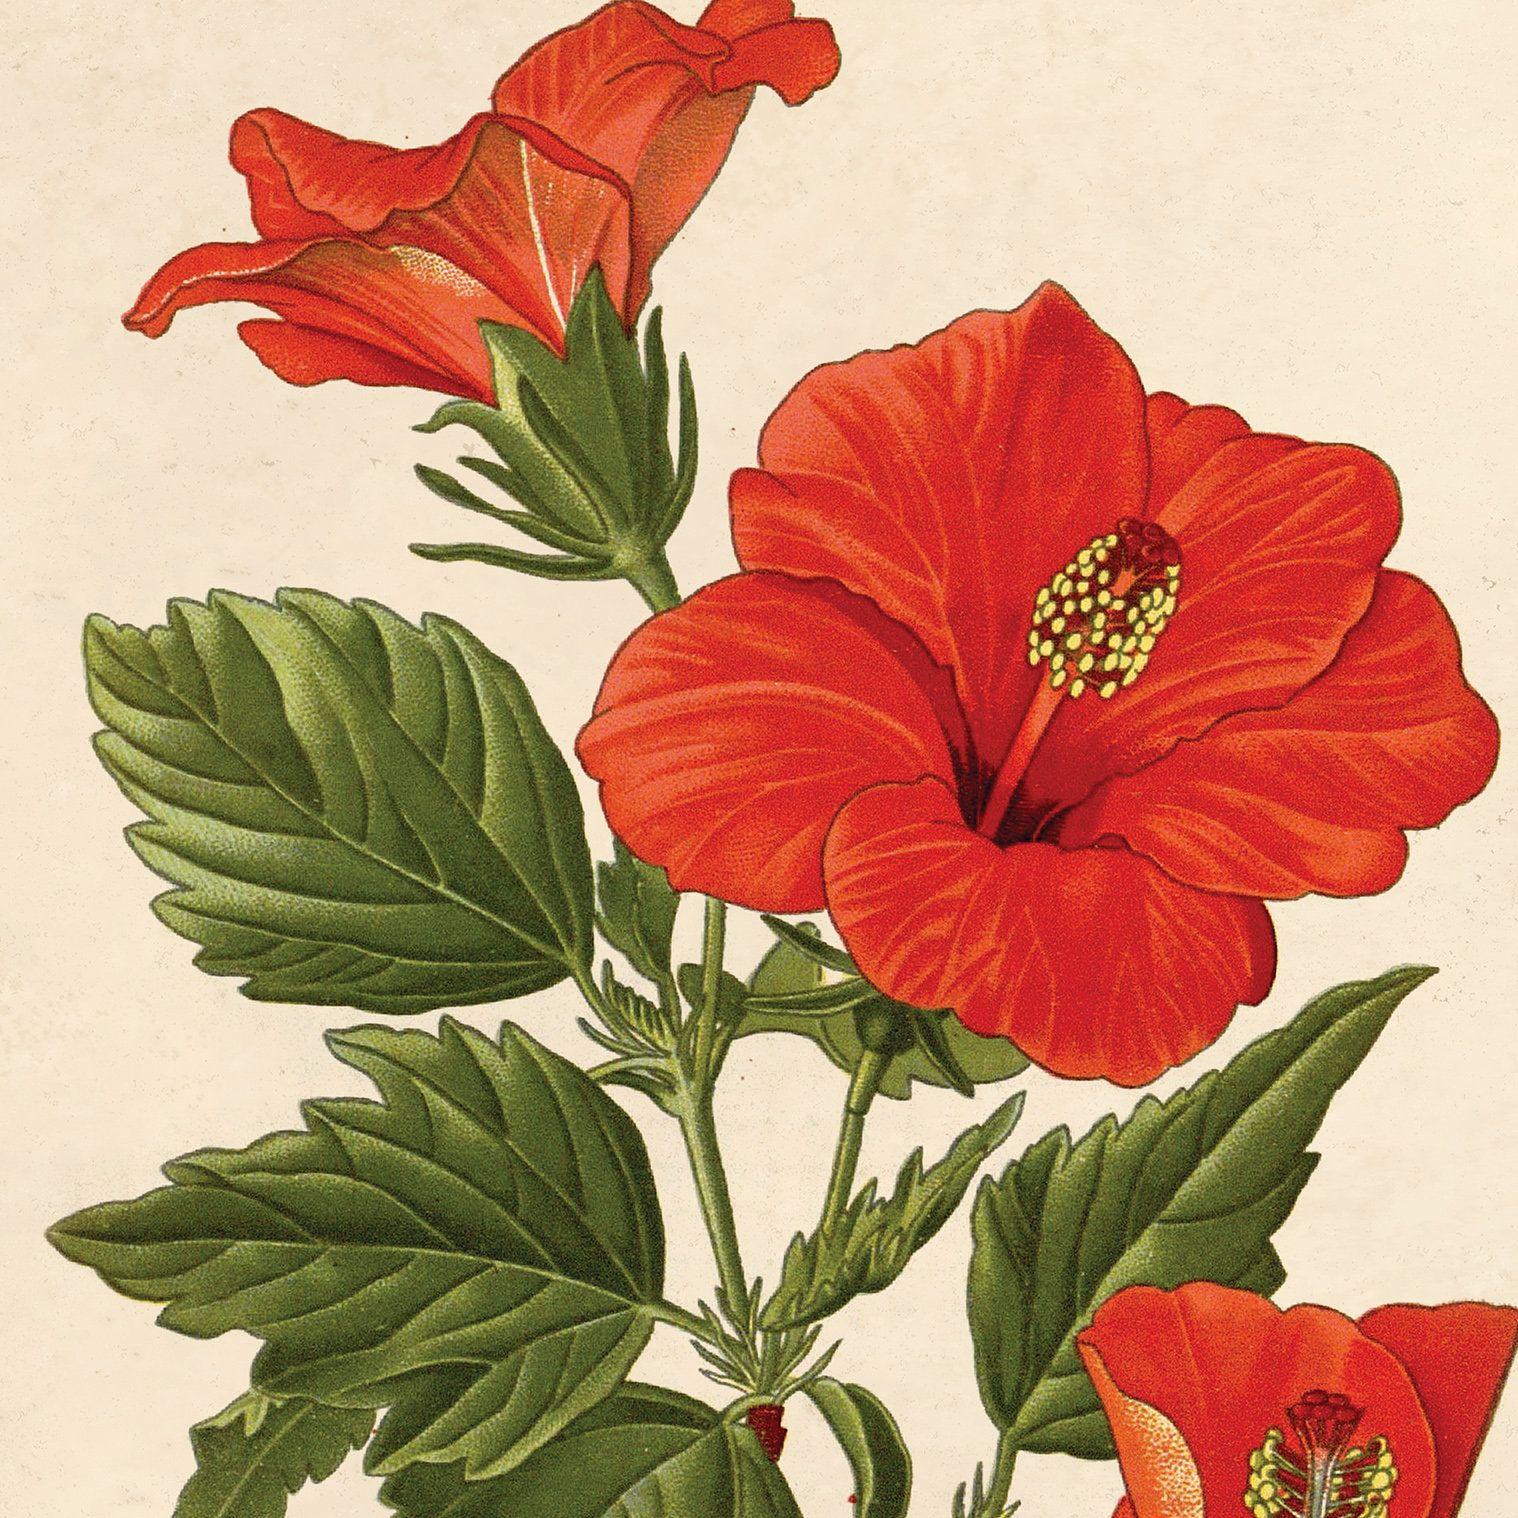 Vintage Tropical Hibiscus Flower Print. Educational